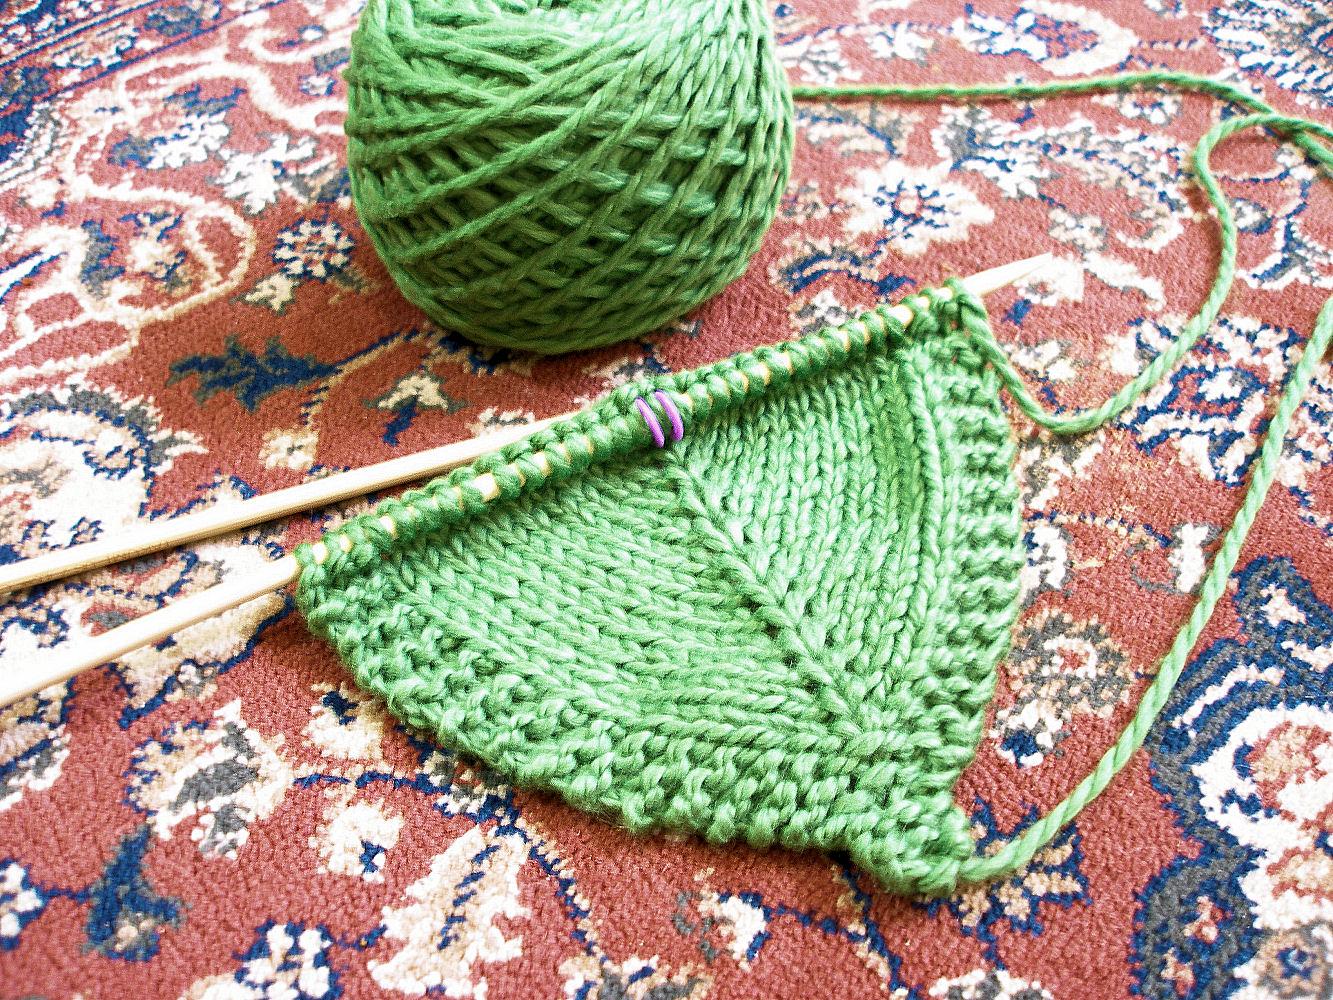 JeweledElegance: Knitted Leaf Pattern & Clover Stitch Markers